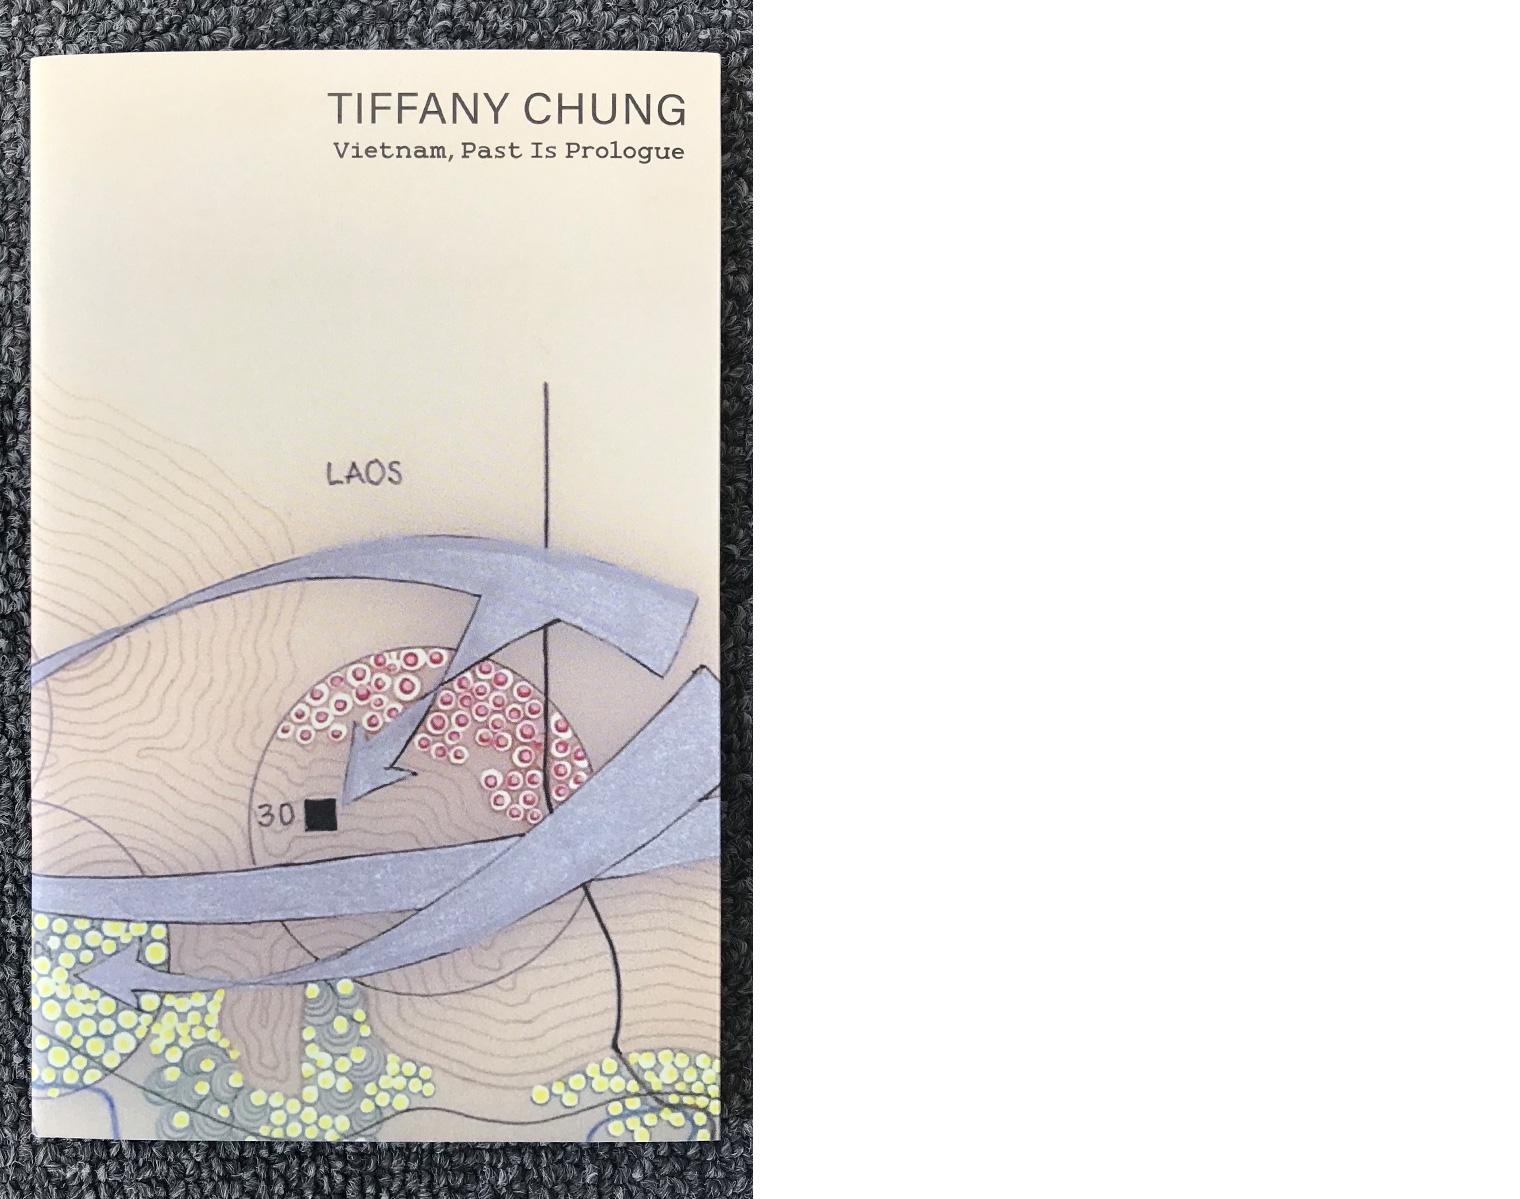 Tiffany Chung, Vietnam Past is Prologue